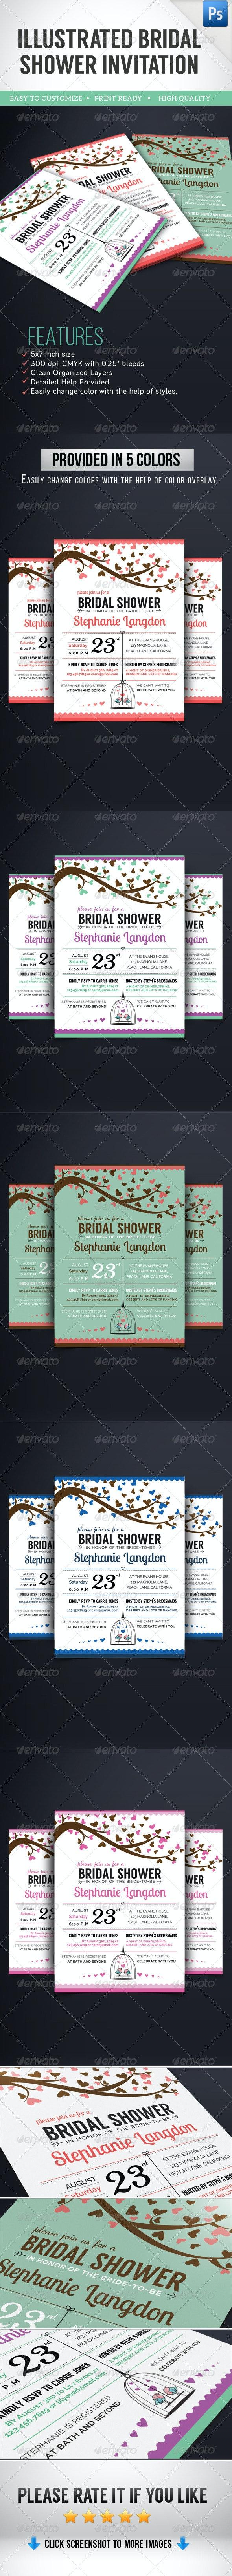 Illustrated Bridal Shower Invitation - Weddings Cards & Invites